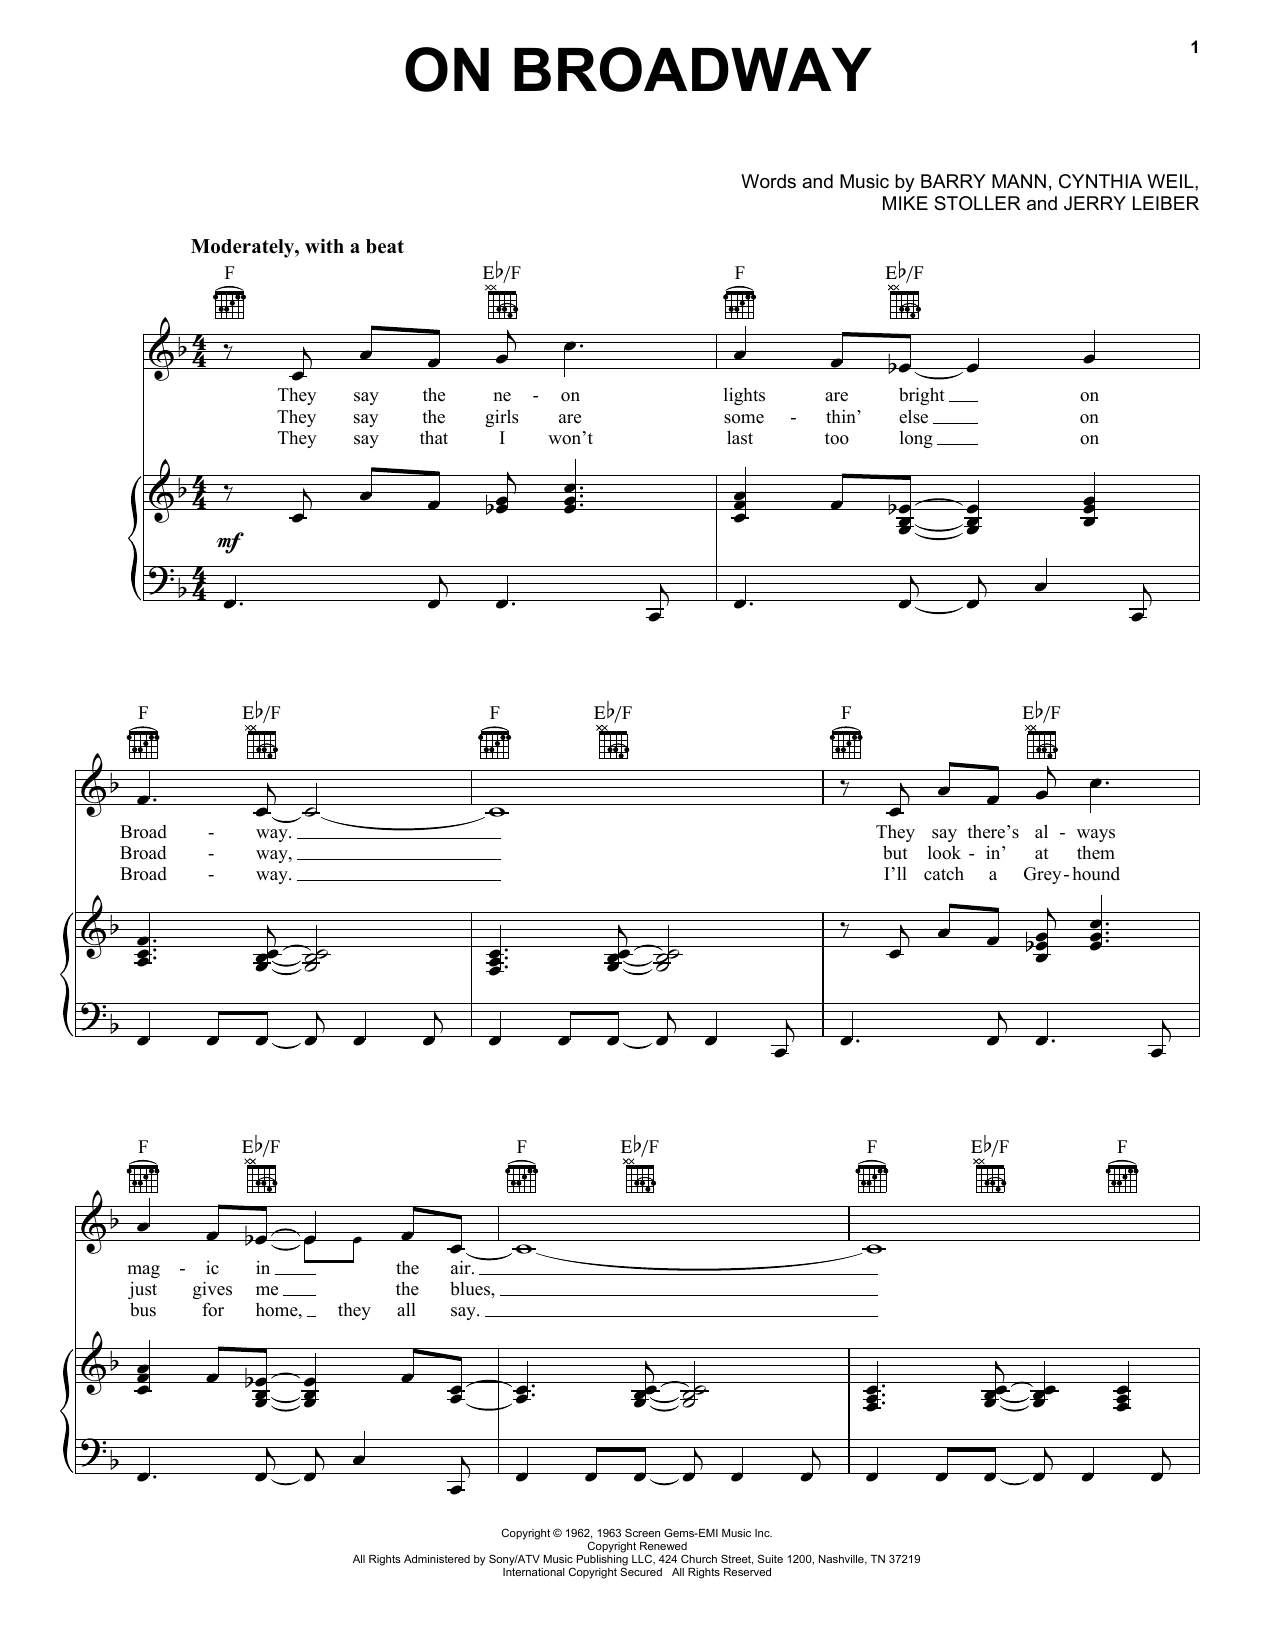 On Broadway sheet music